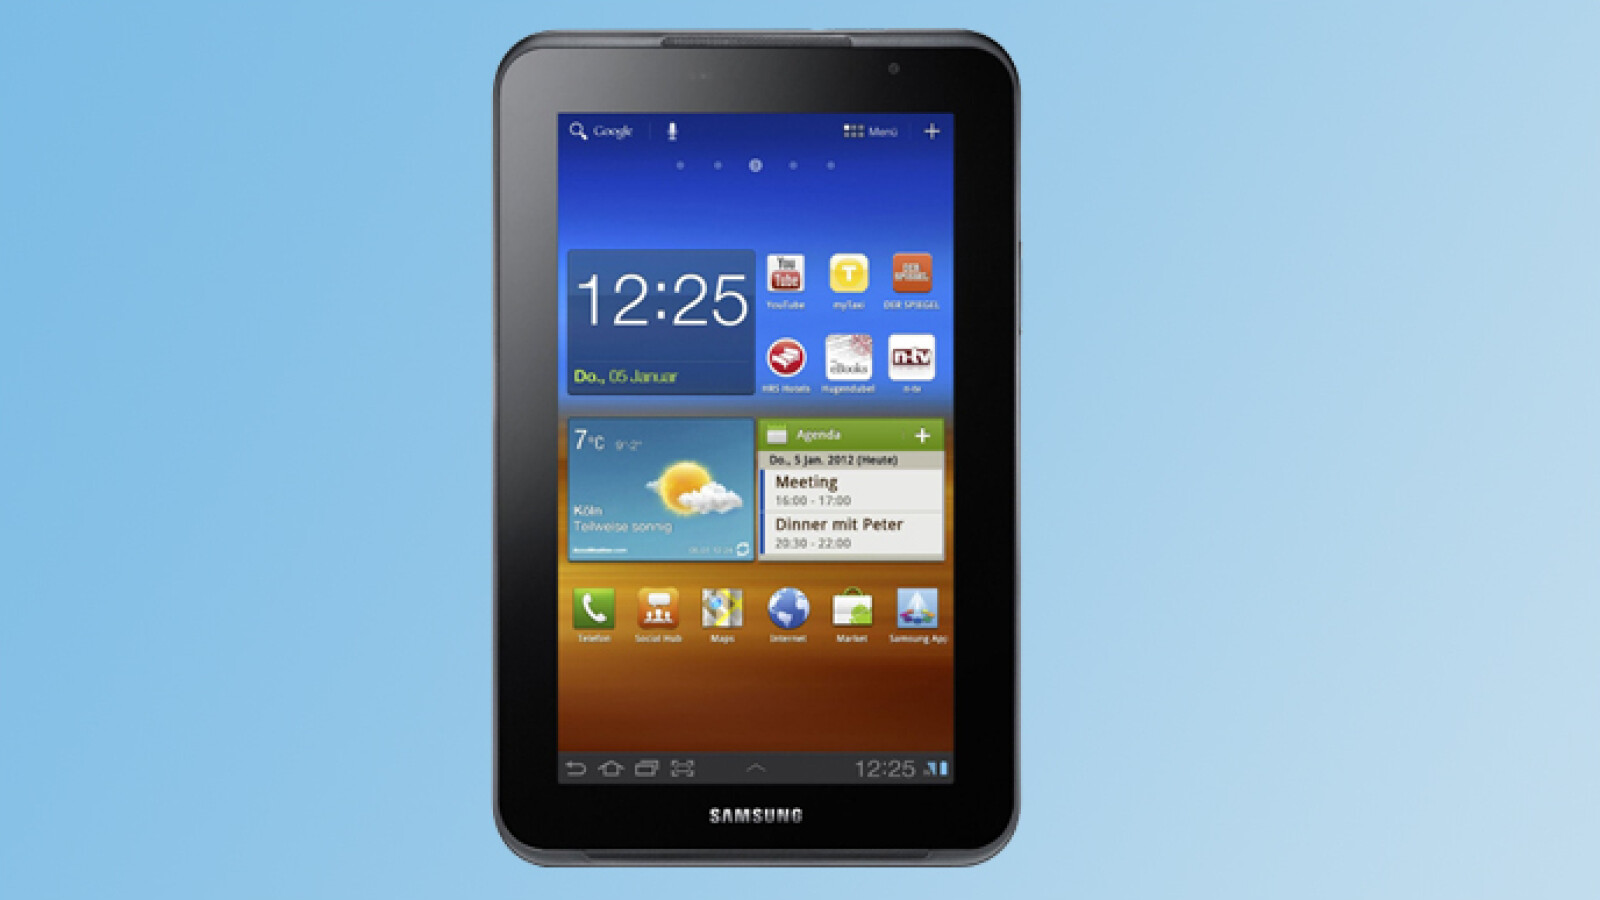 Galaxy Tab 7.0 Plus N in the Practice Test